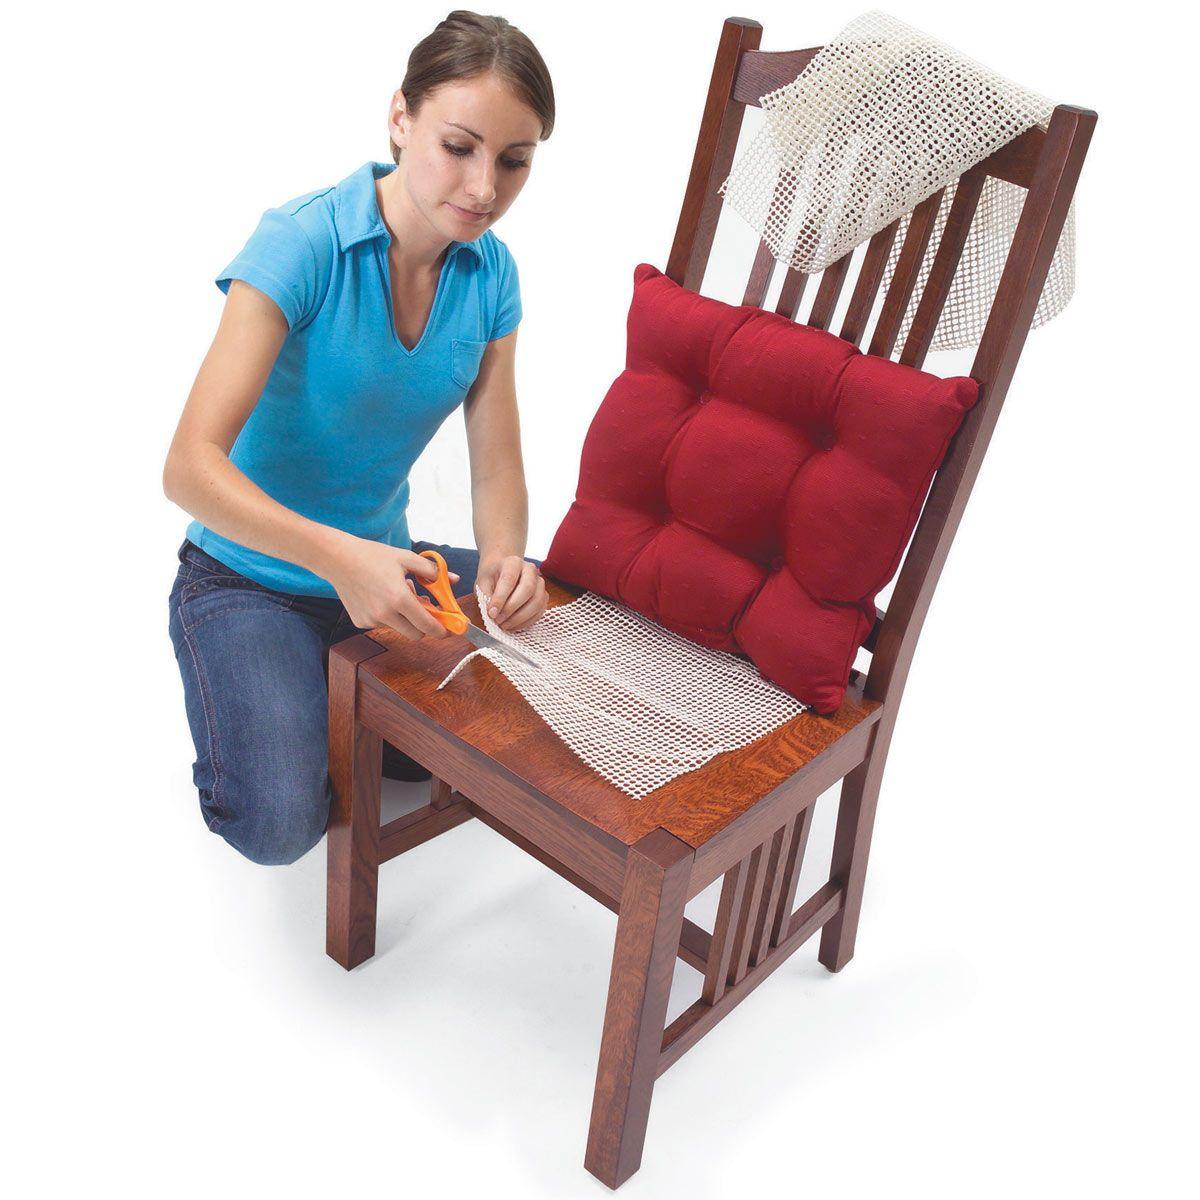 45 Hugely Helpful Handy Hints Seat Cushions Home Hacks Homeowner